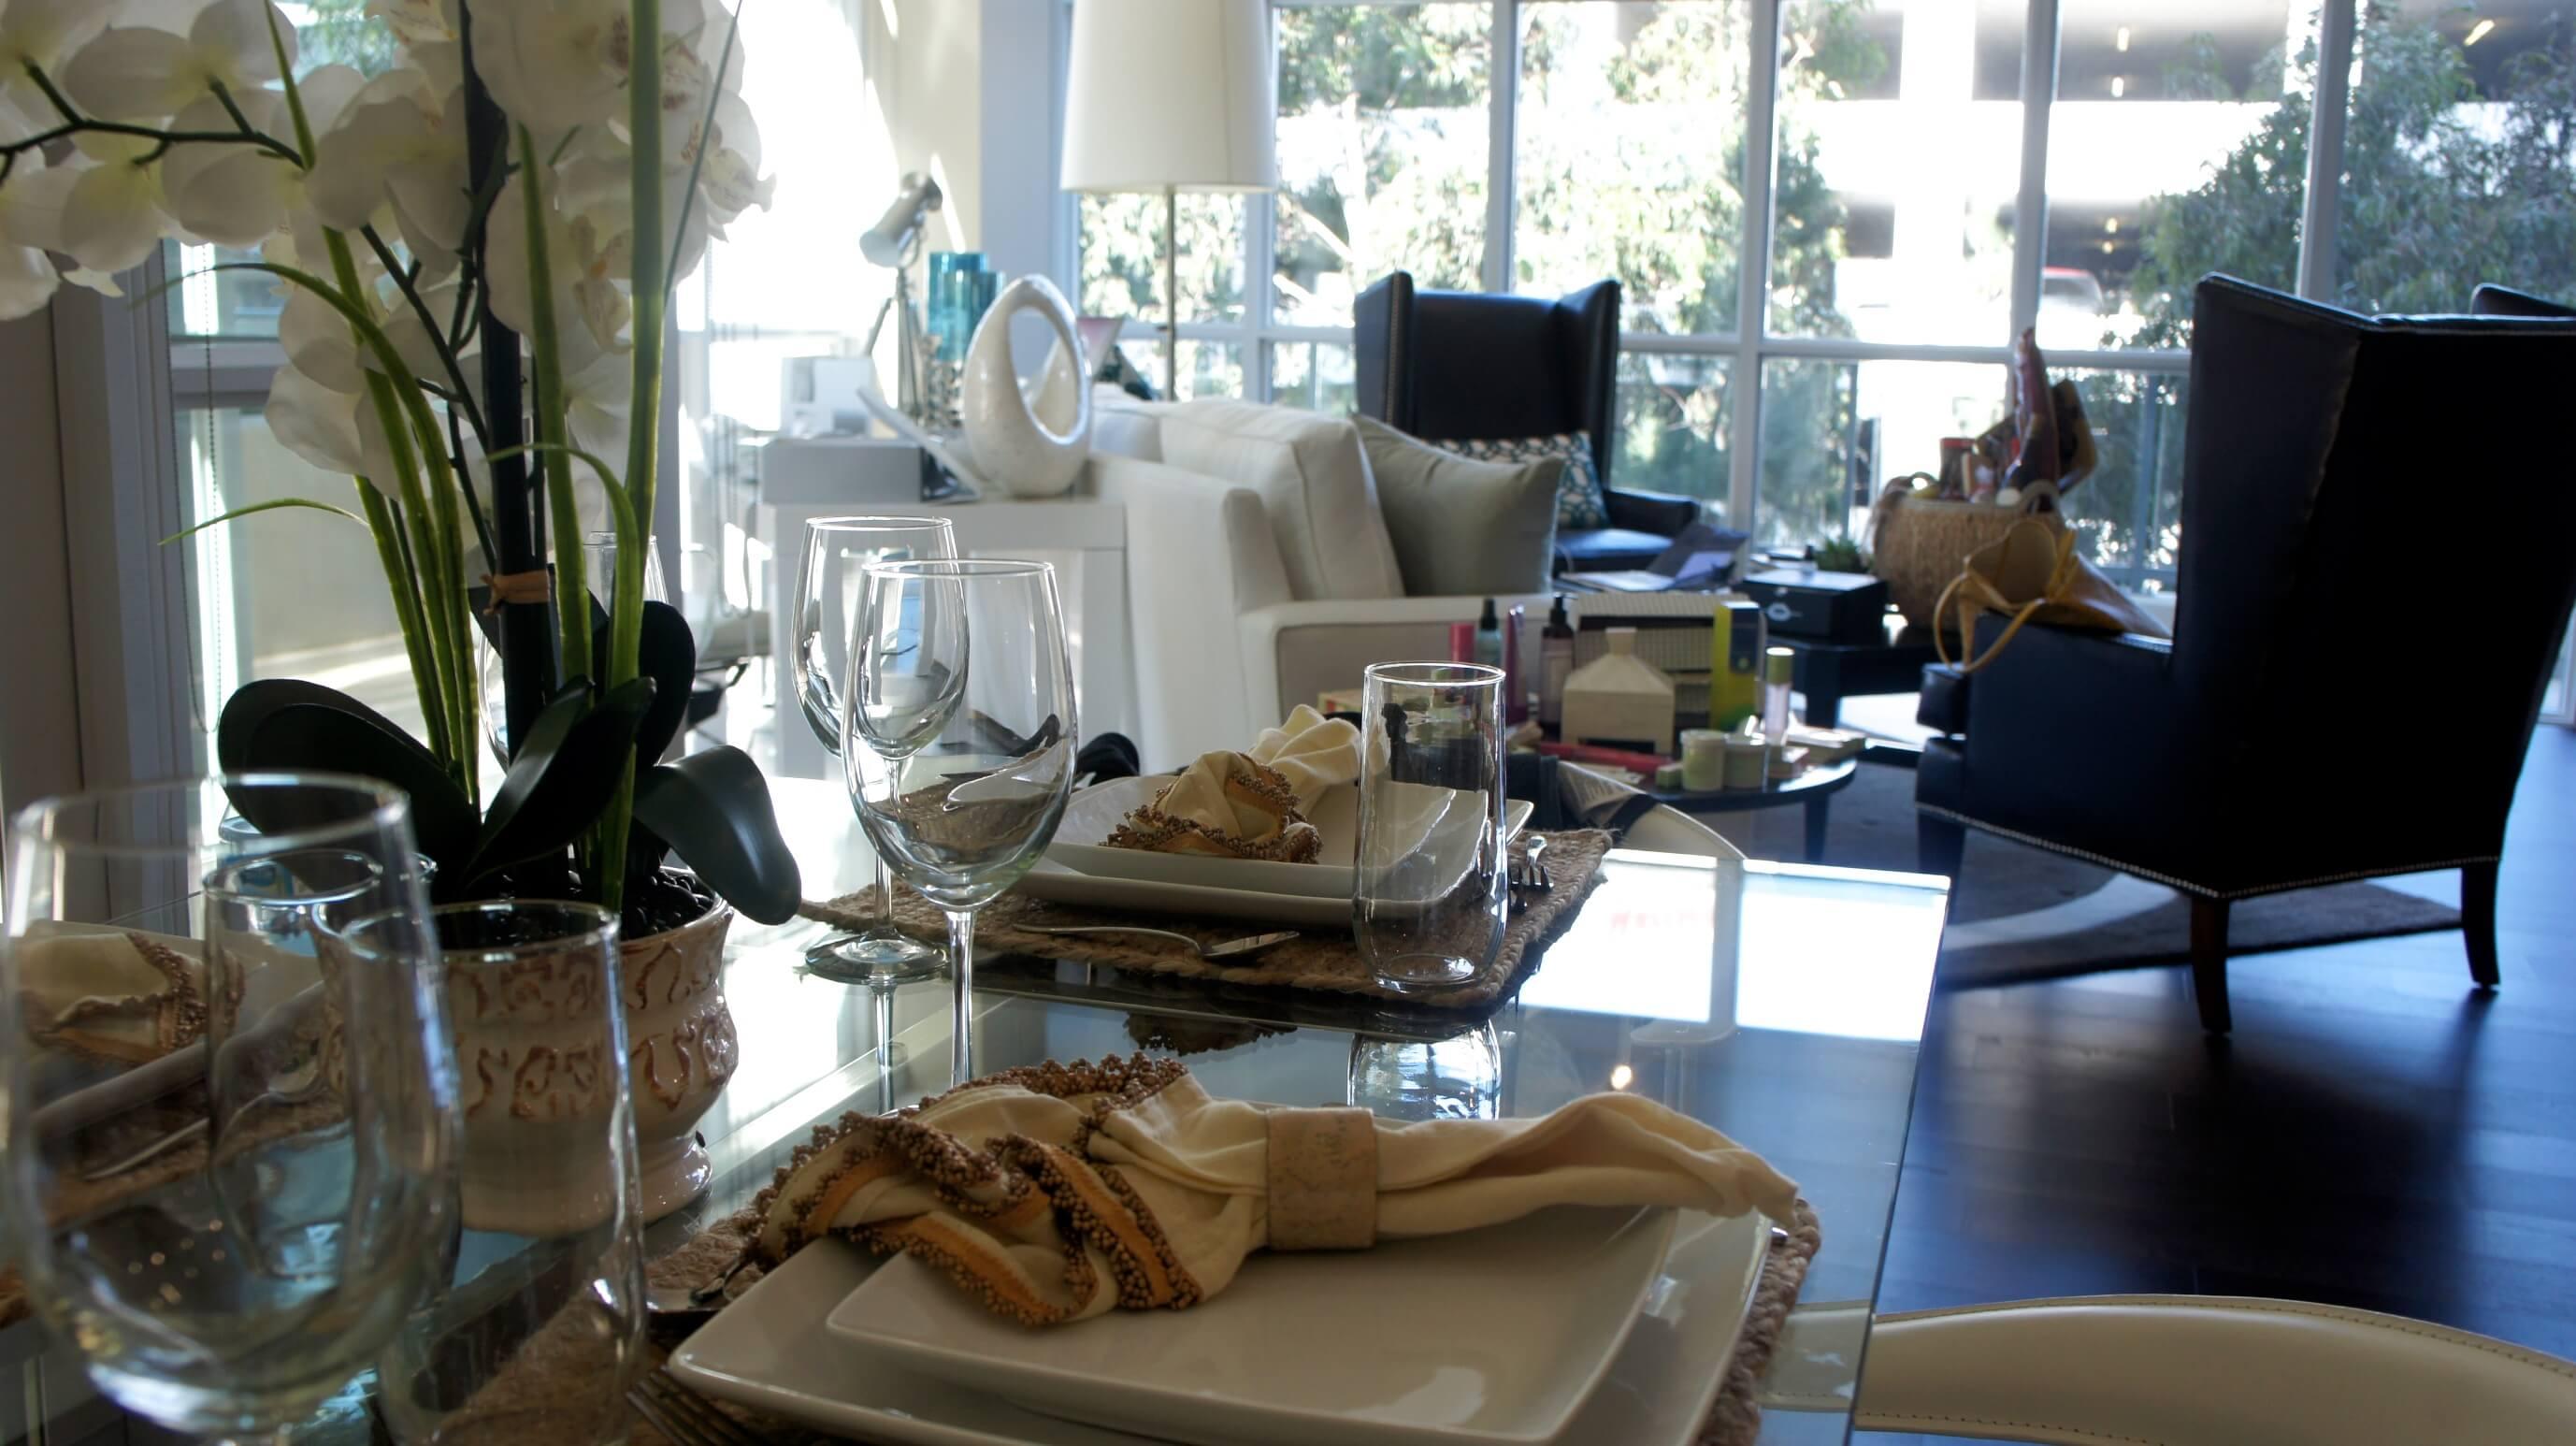 astoria-at-central-park-west-x-nubry-luxury-apartments-irvine-california-2